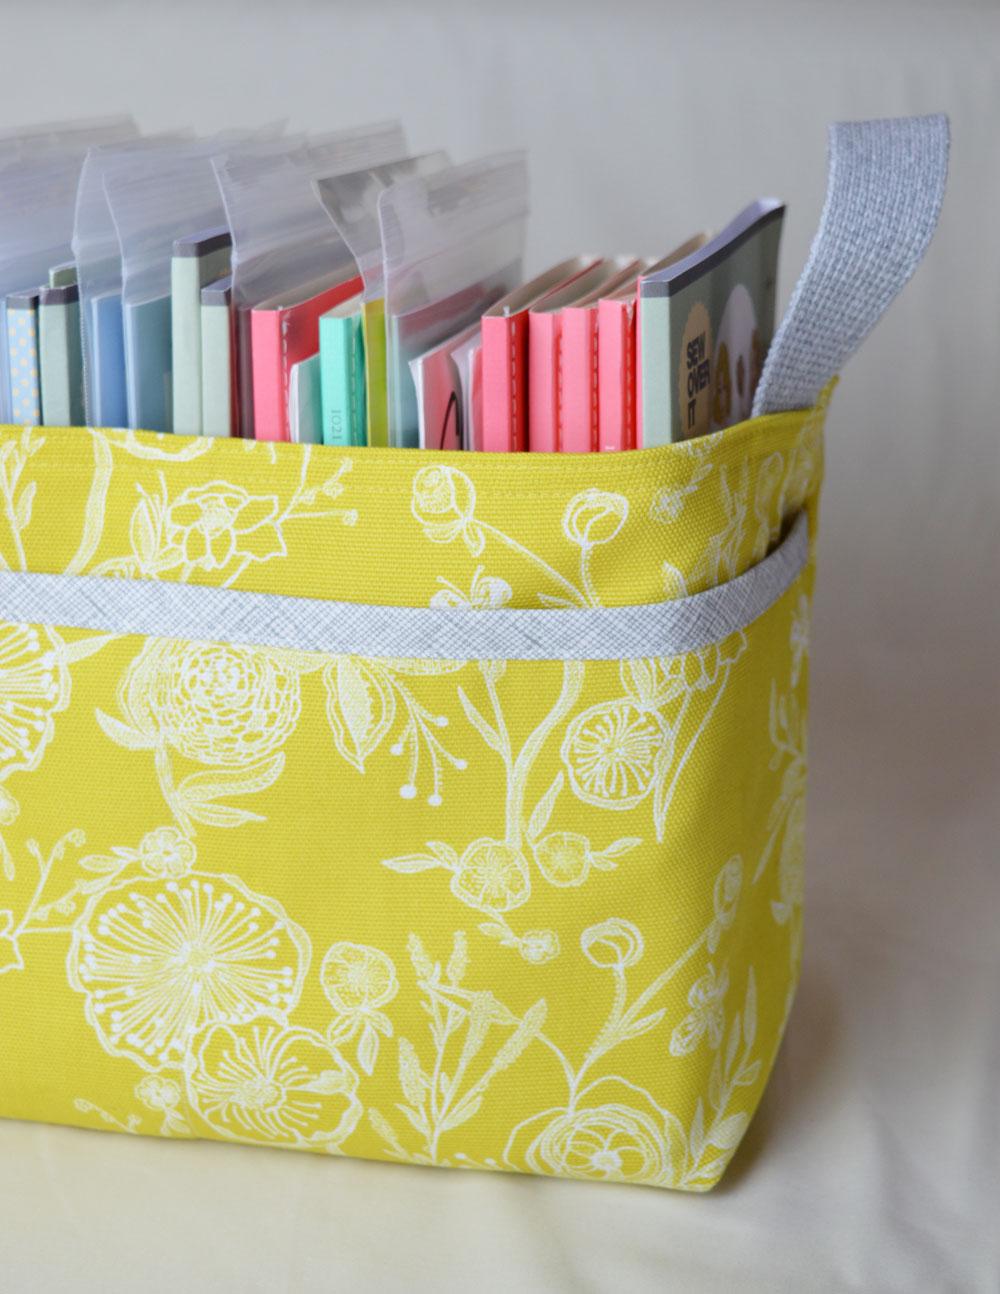 Noodle-head Divided Basket - Millie Fleur Line Drawings Canvas | Holm Sown